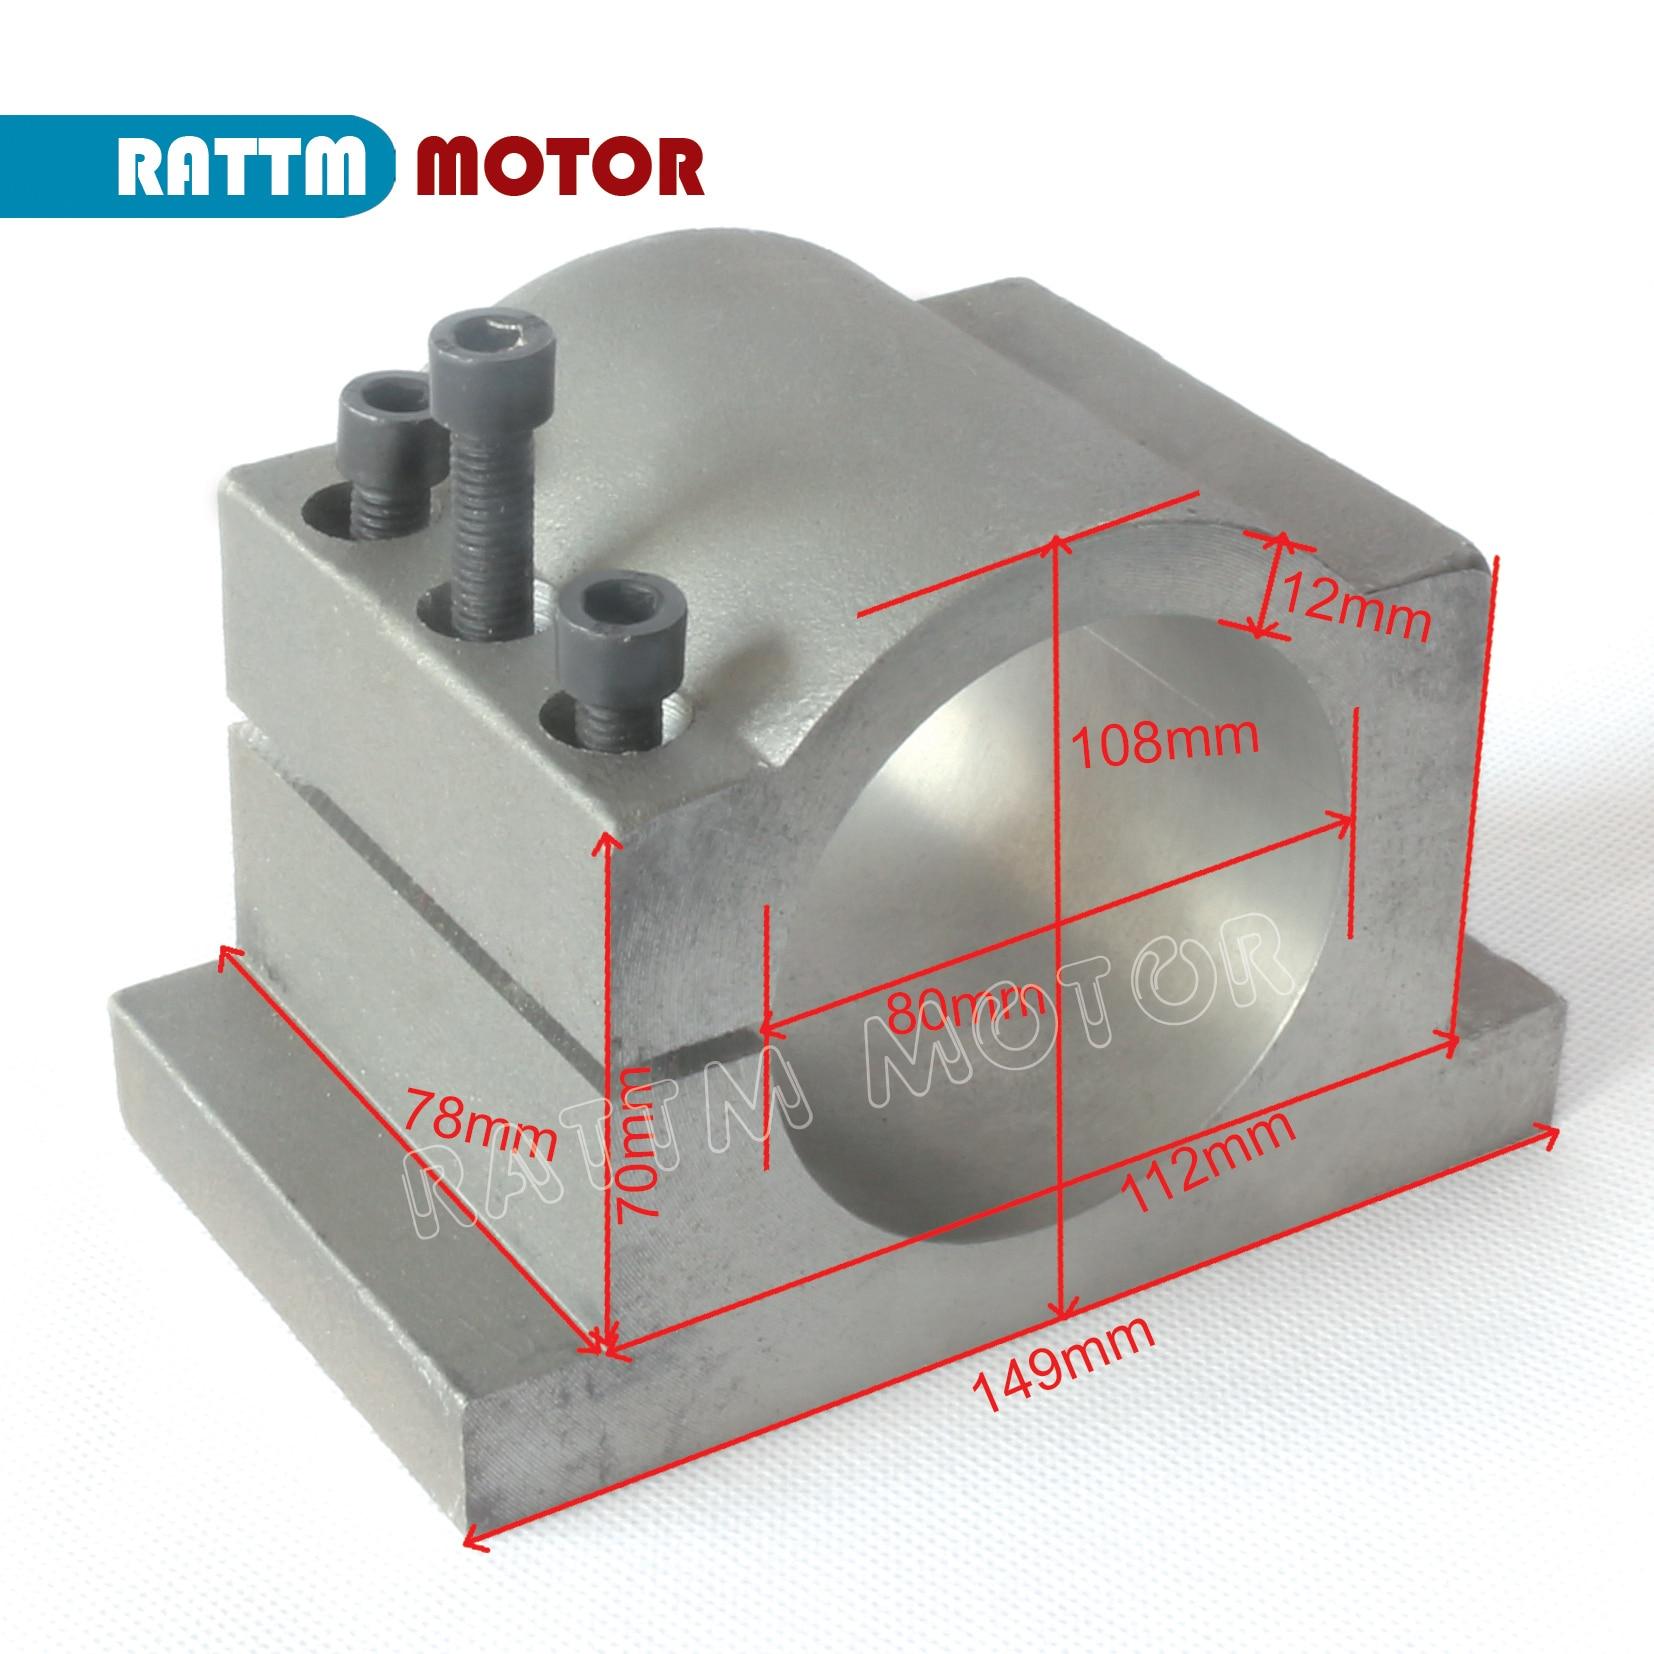 Купить с кэшбэком CNC Lathe 2.2kw Water Cooling spindle motor kit ER20 & 2.2kw Inverter VFD 2HP & 80mm Clamp & Water pump pipe for Router machine